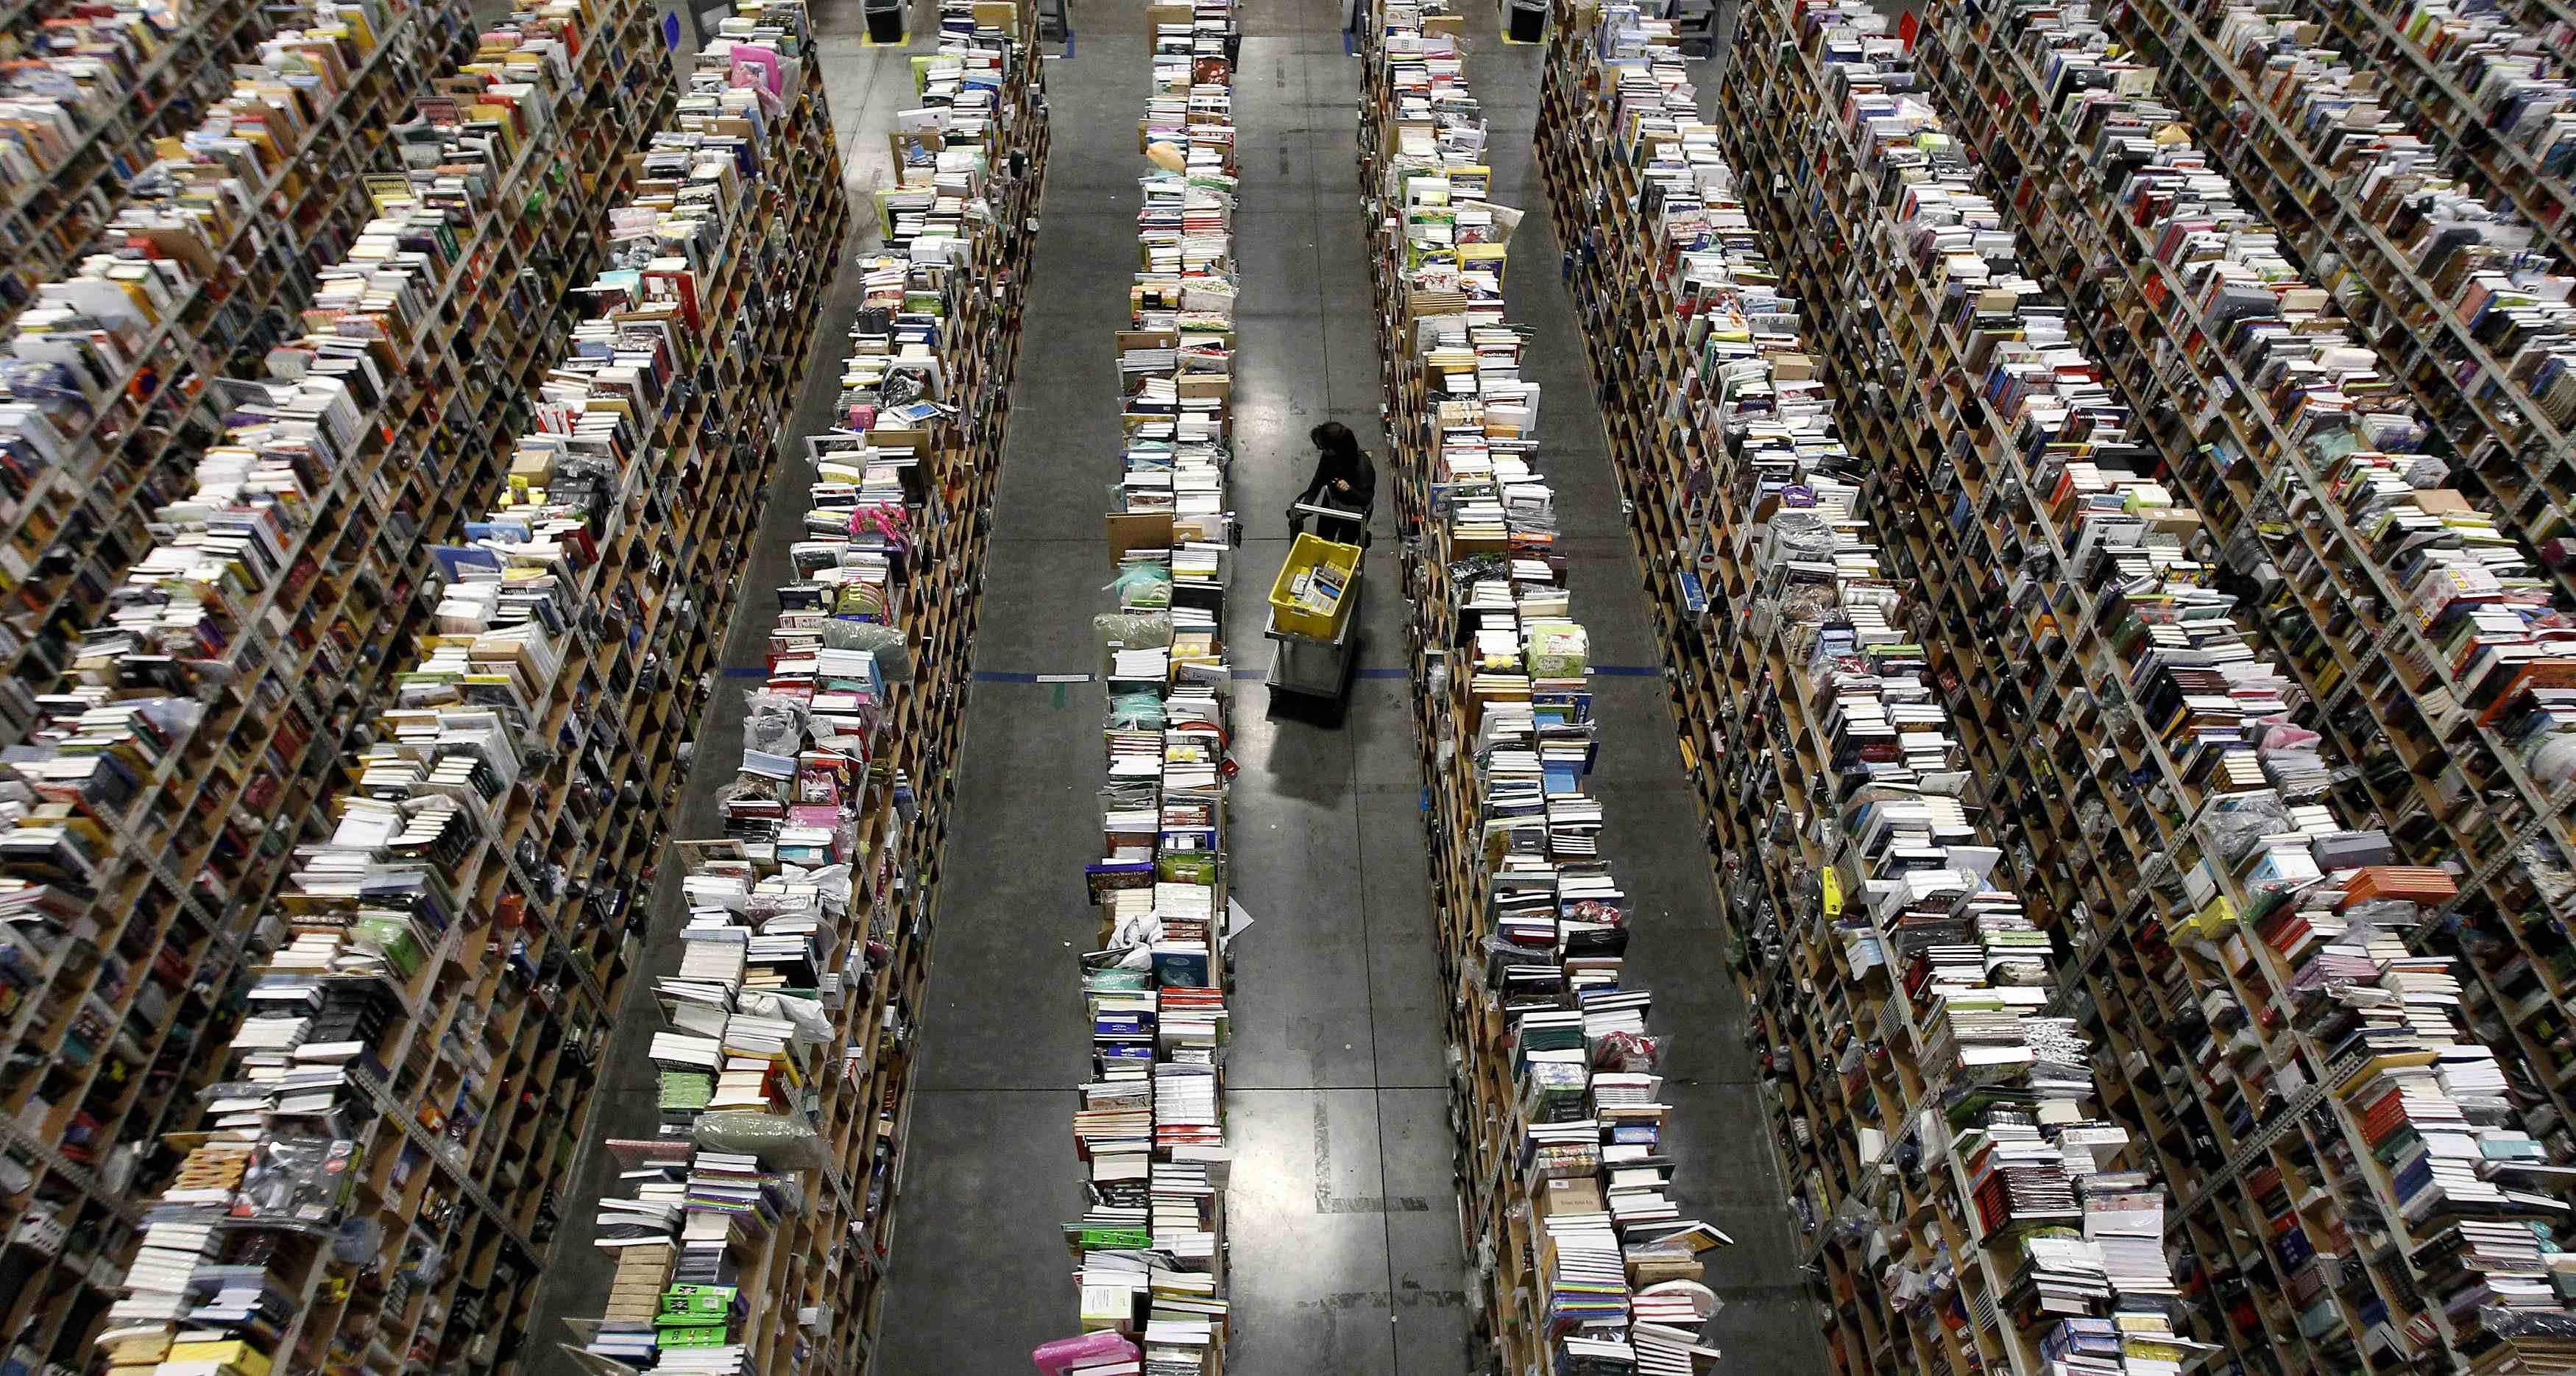 Amazon's New $5 Billion Headquarters May Ruin Your City